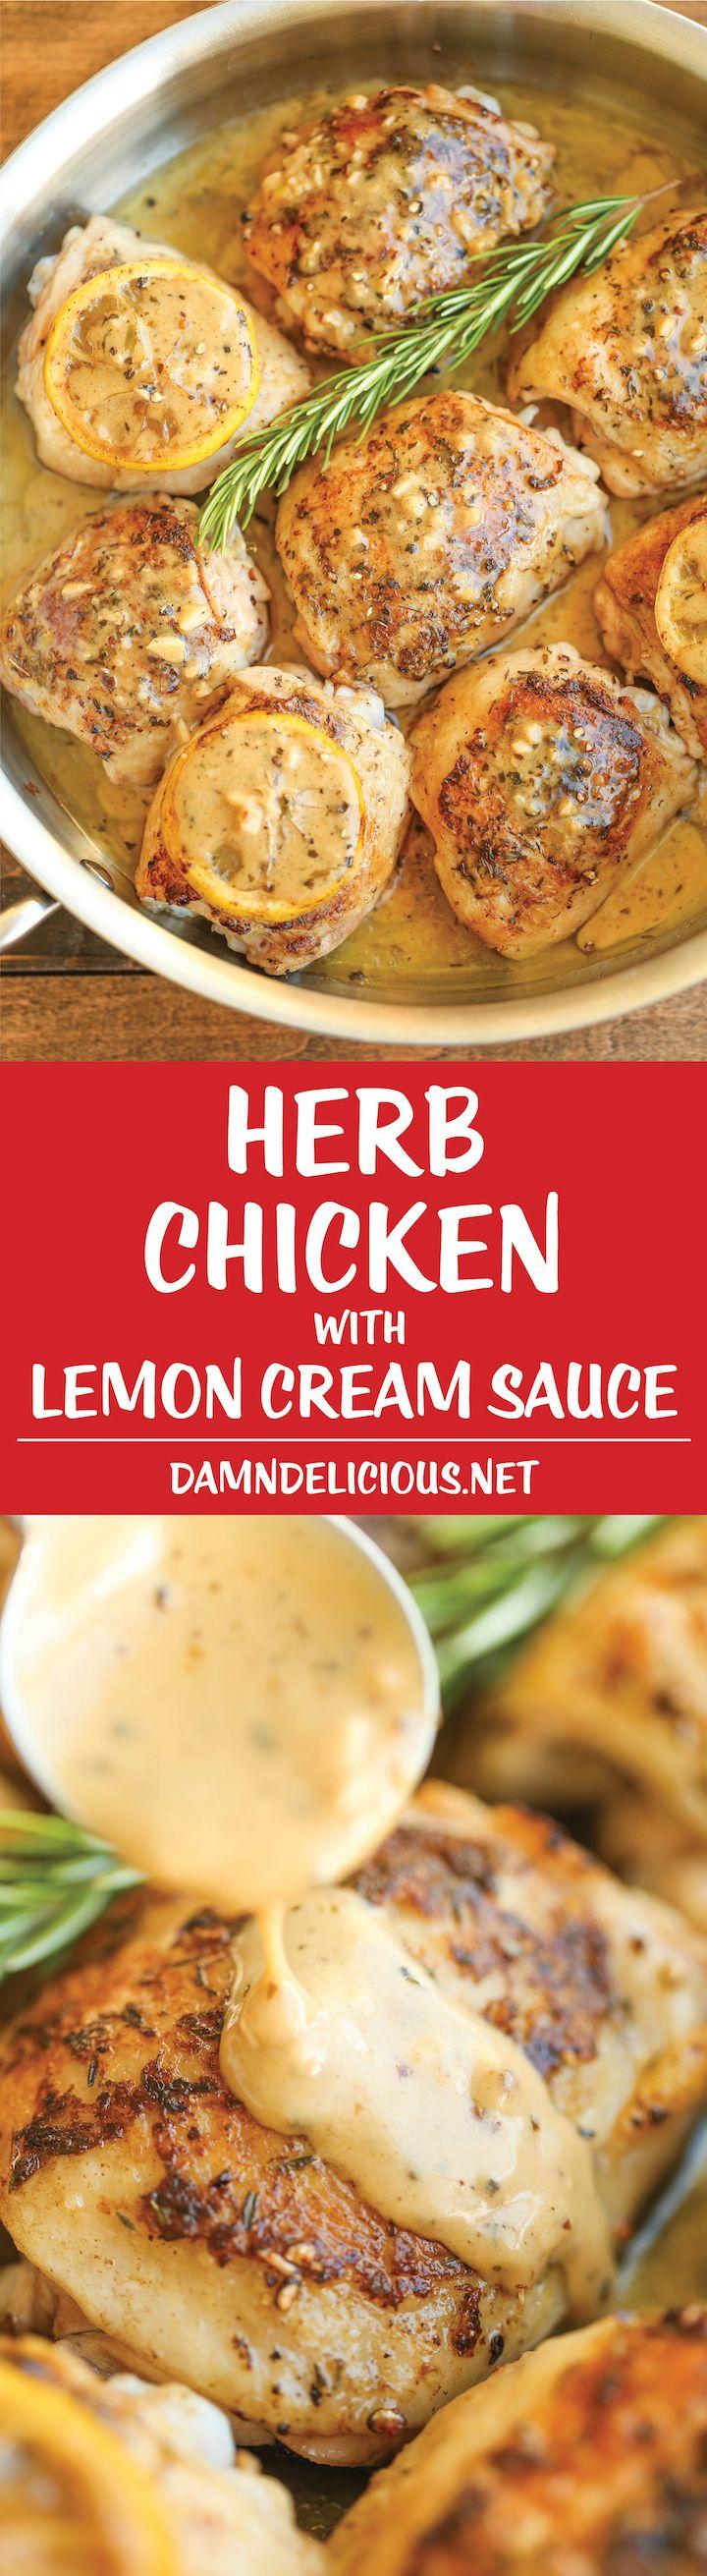 Herb Chicken With Lemon Cream Sauce Recipe Chicken Recipes Recipes Cooking Recipes